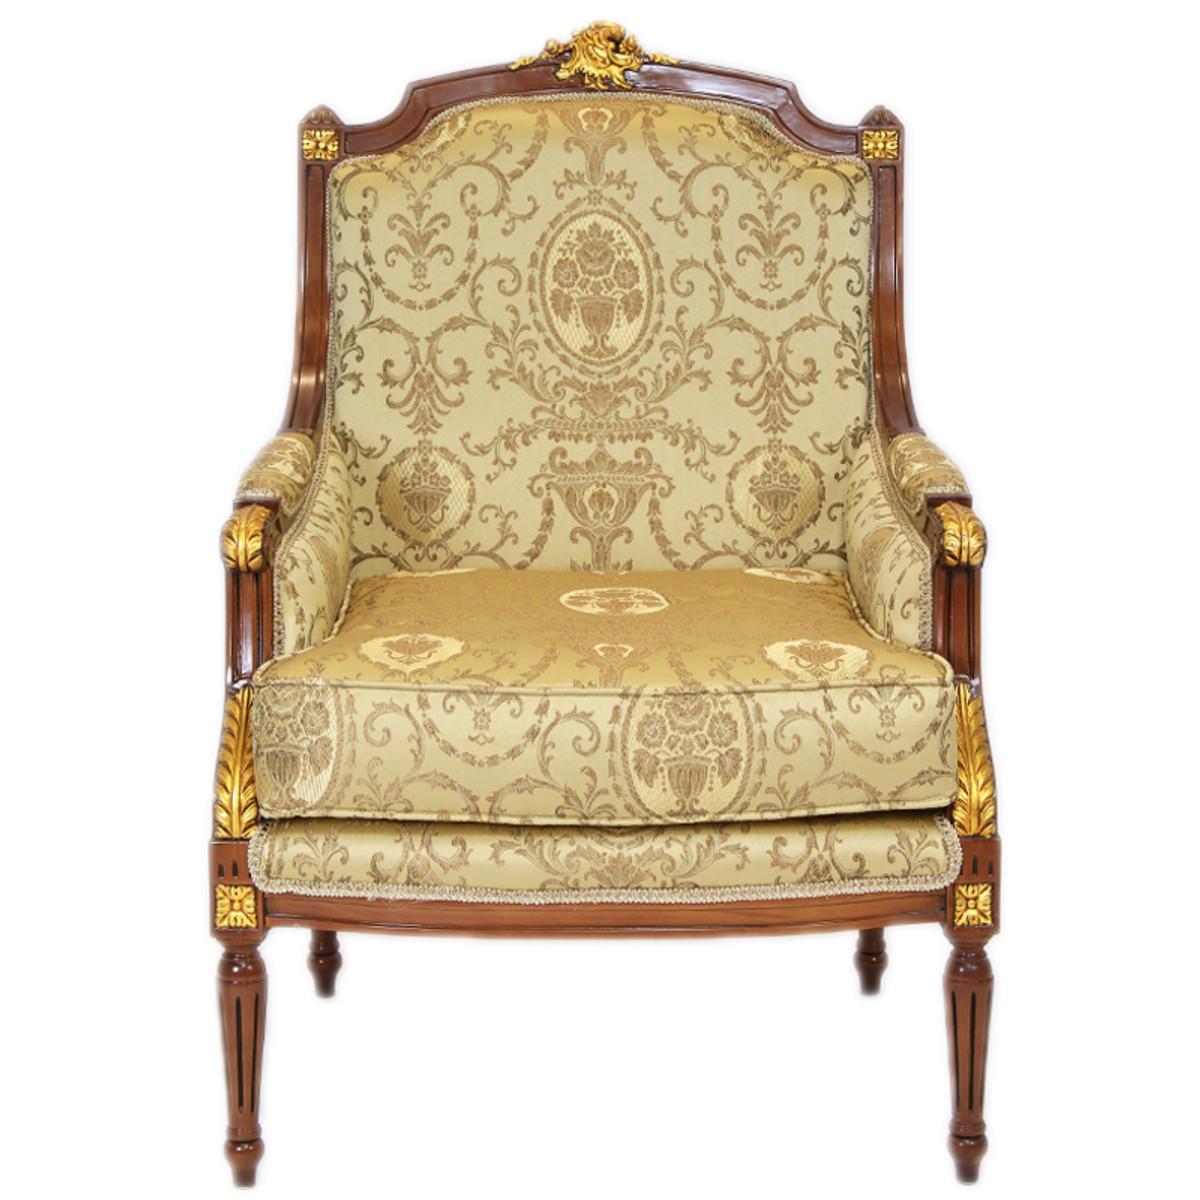 casa padrino barock lounge thron sessel empire gold muster mahagoni braun gold ohren. Black Bedroom Furniture Sets. Home Design Ideas